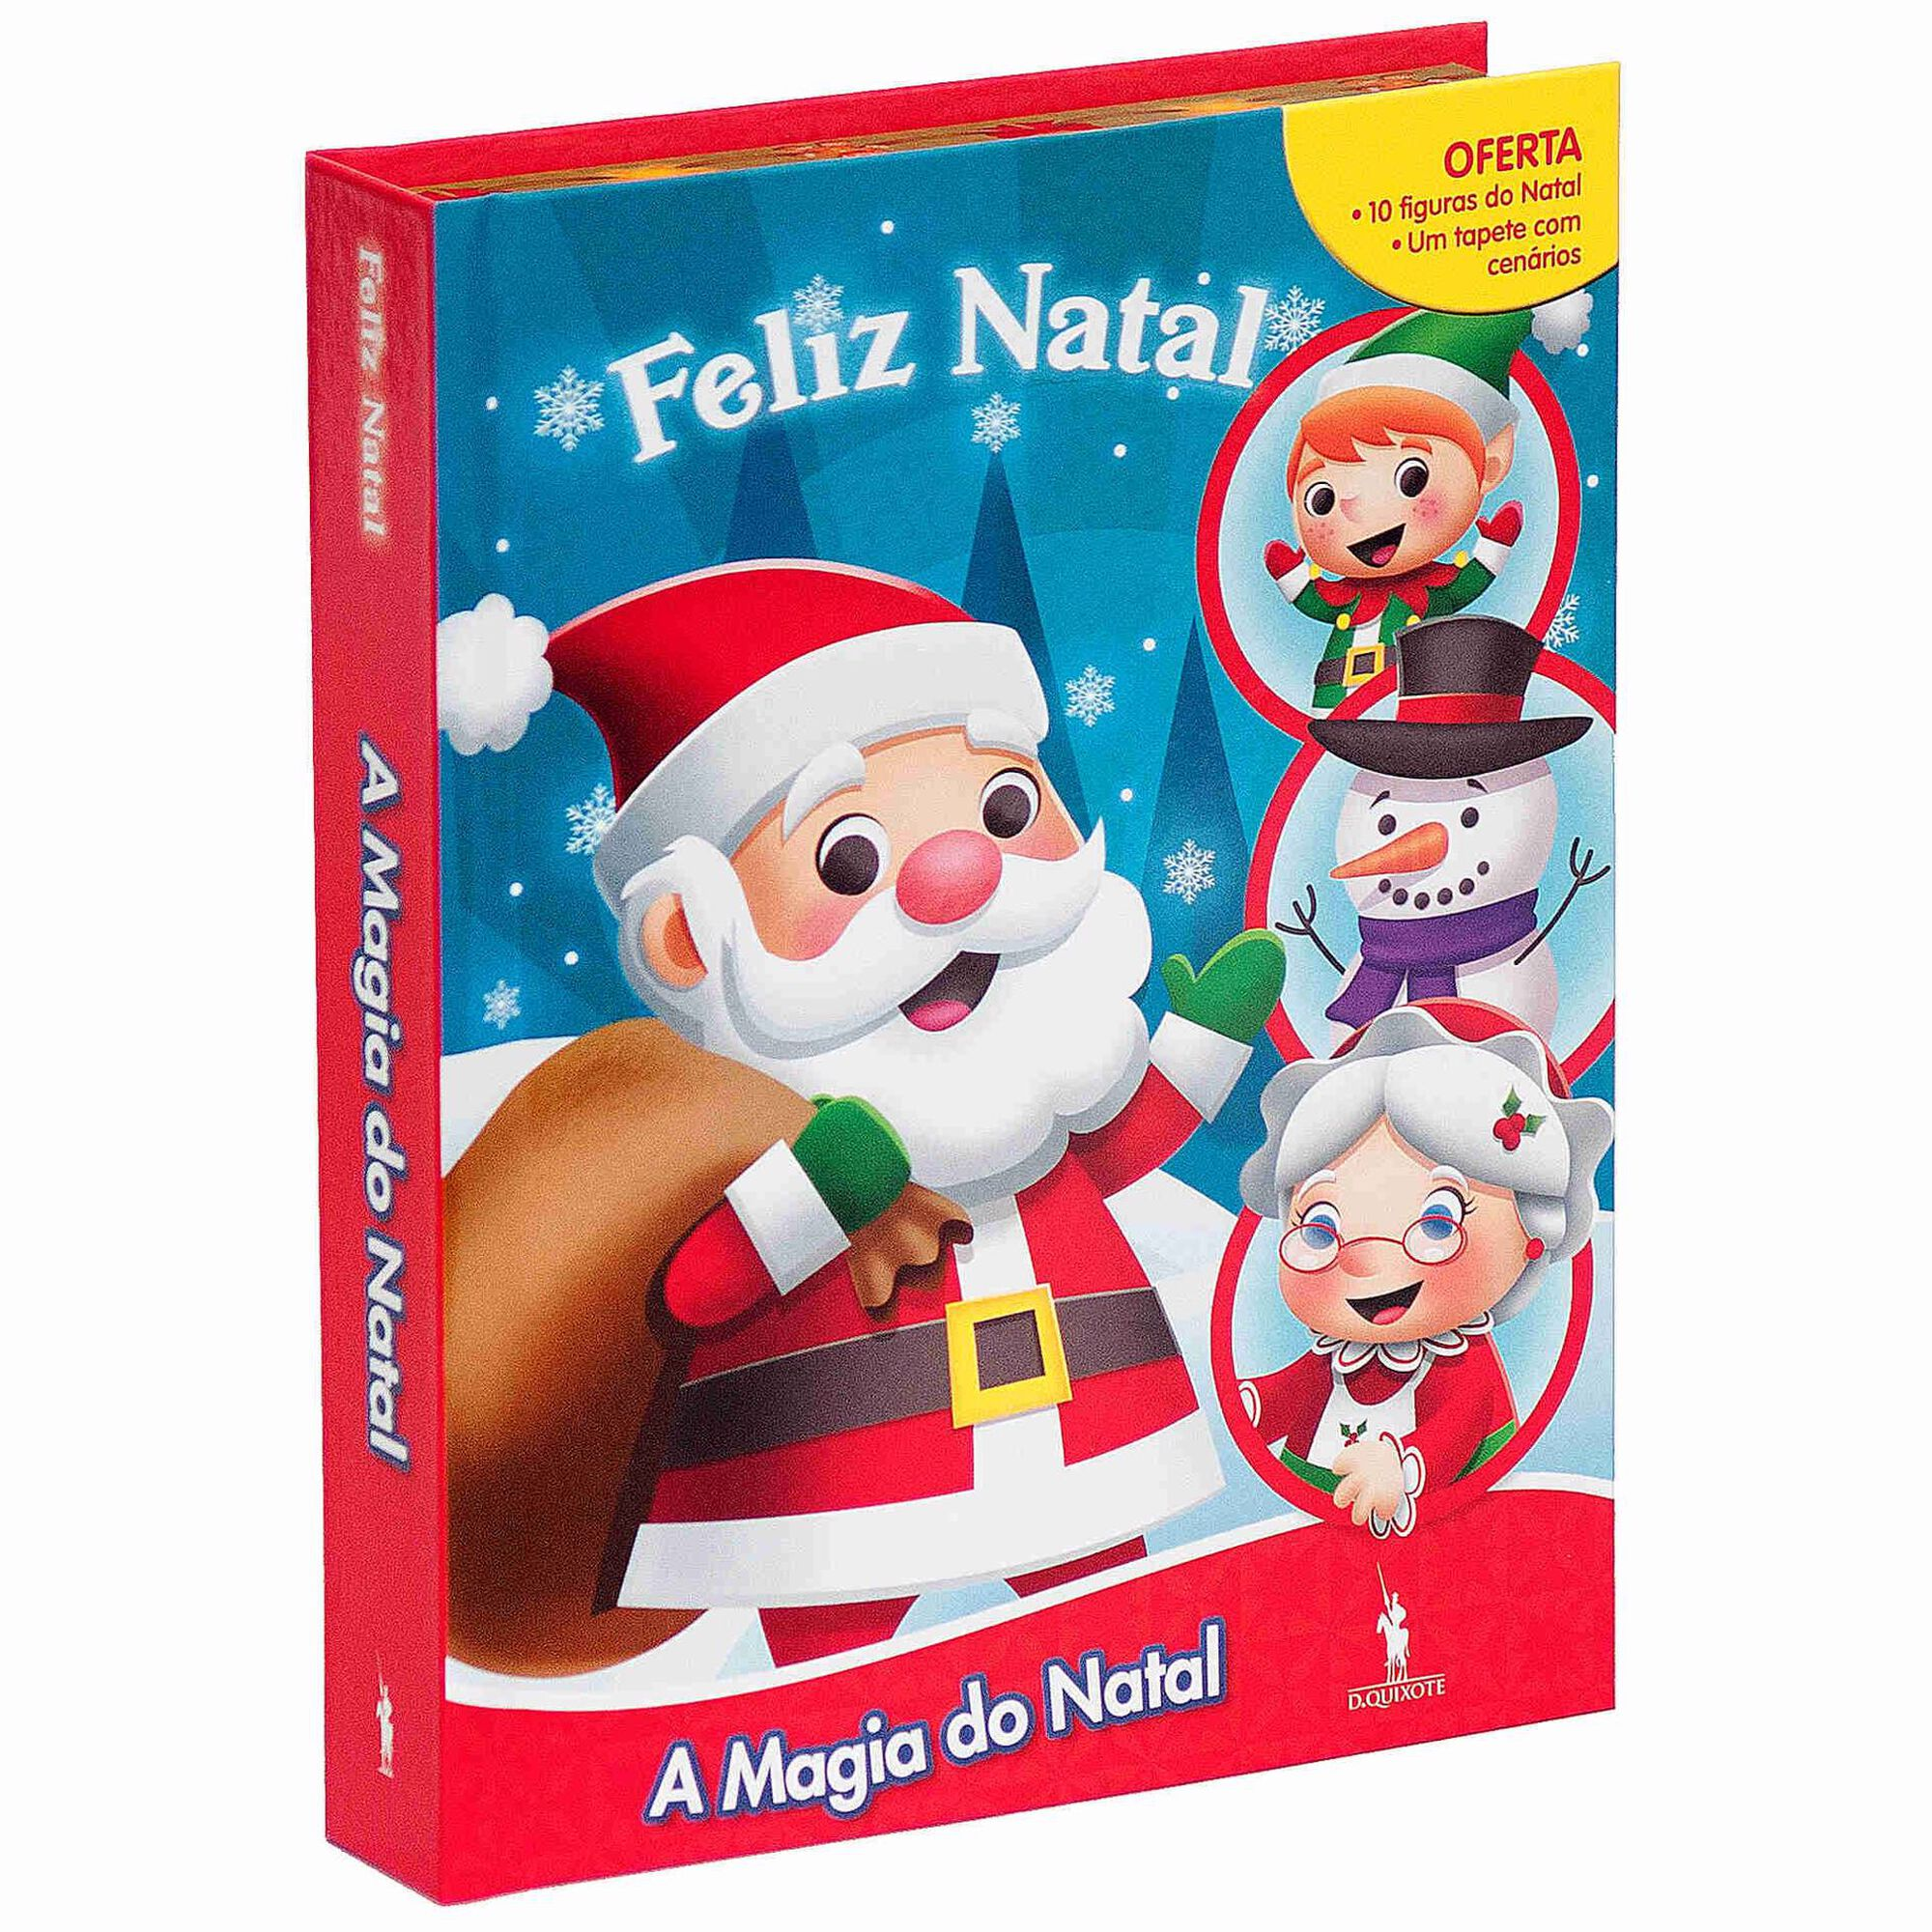 Feliz Natal - A Magia do Natal